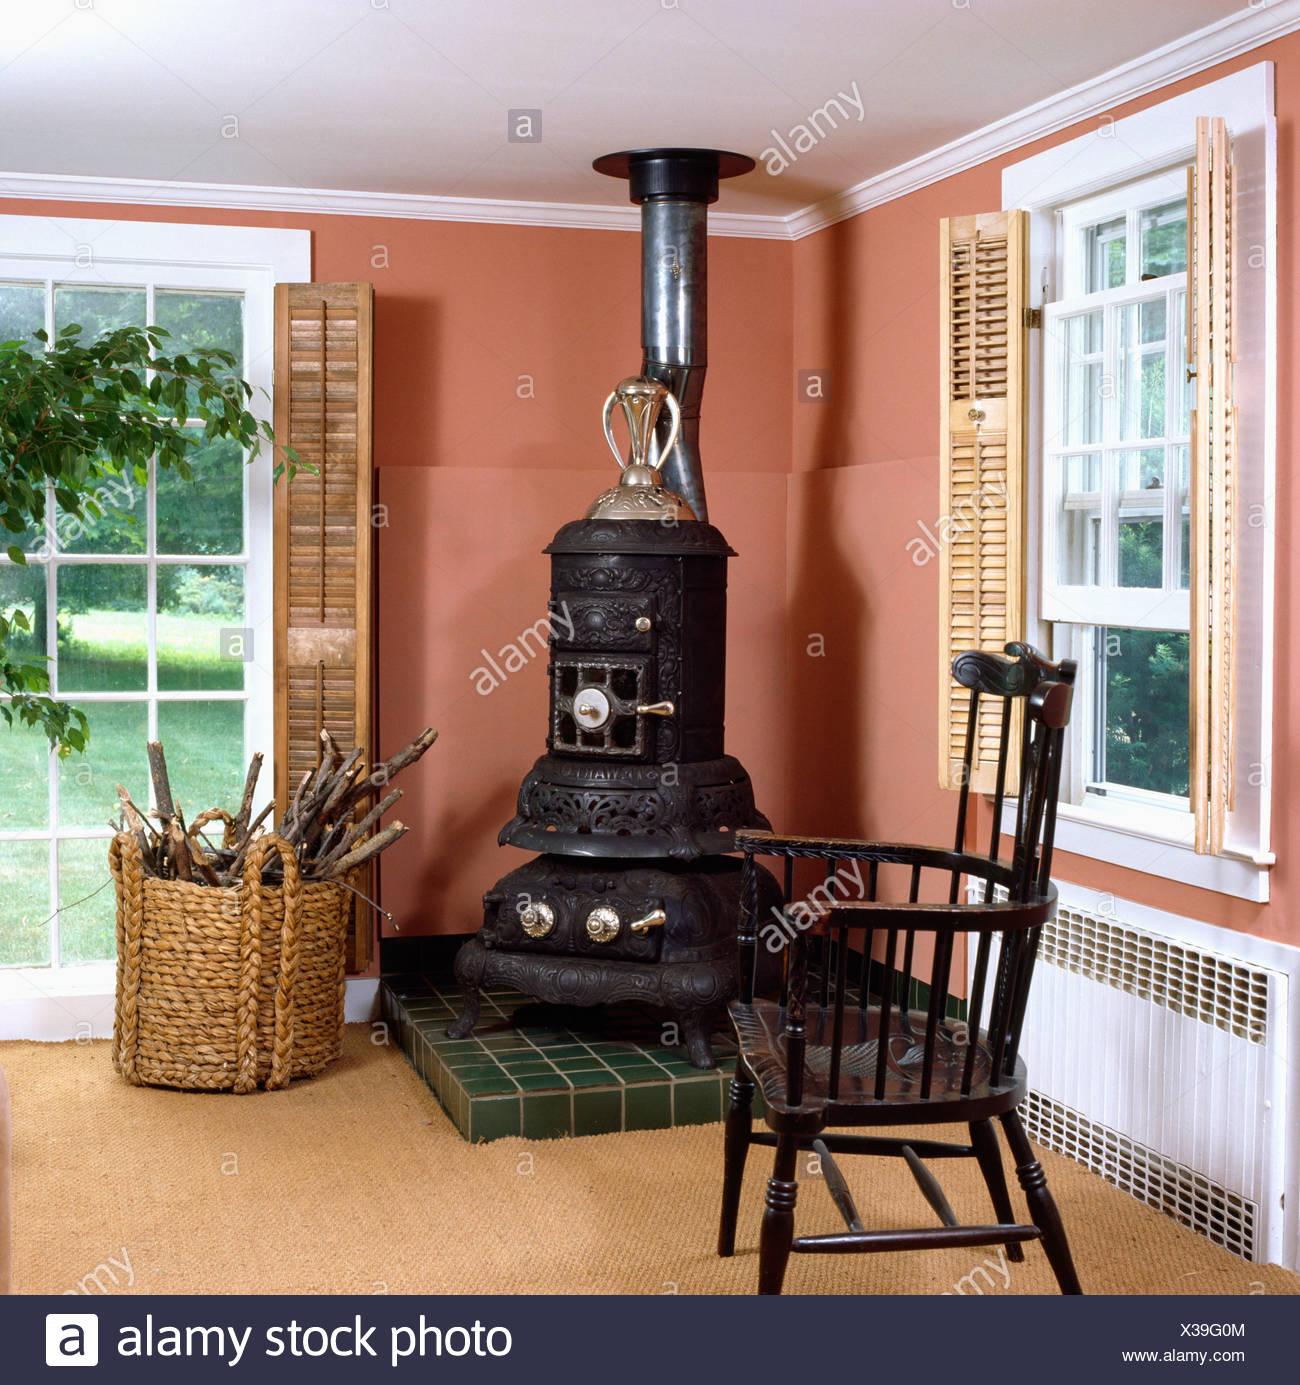 Large Black Stove In Corner Of Sittingroom With Terracotta